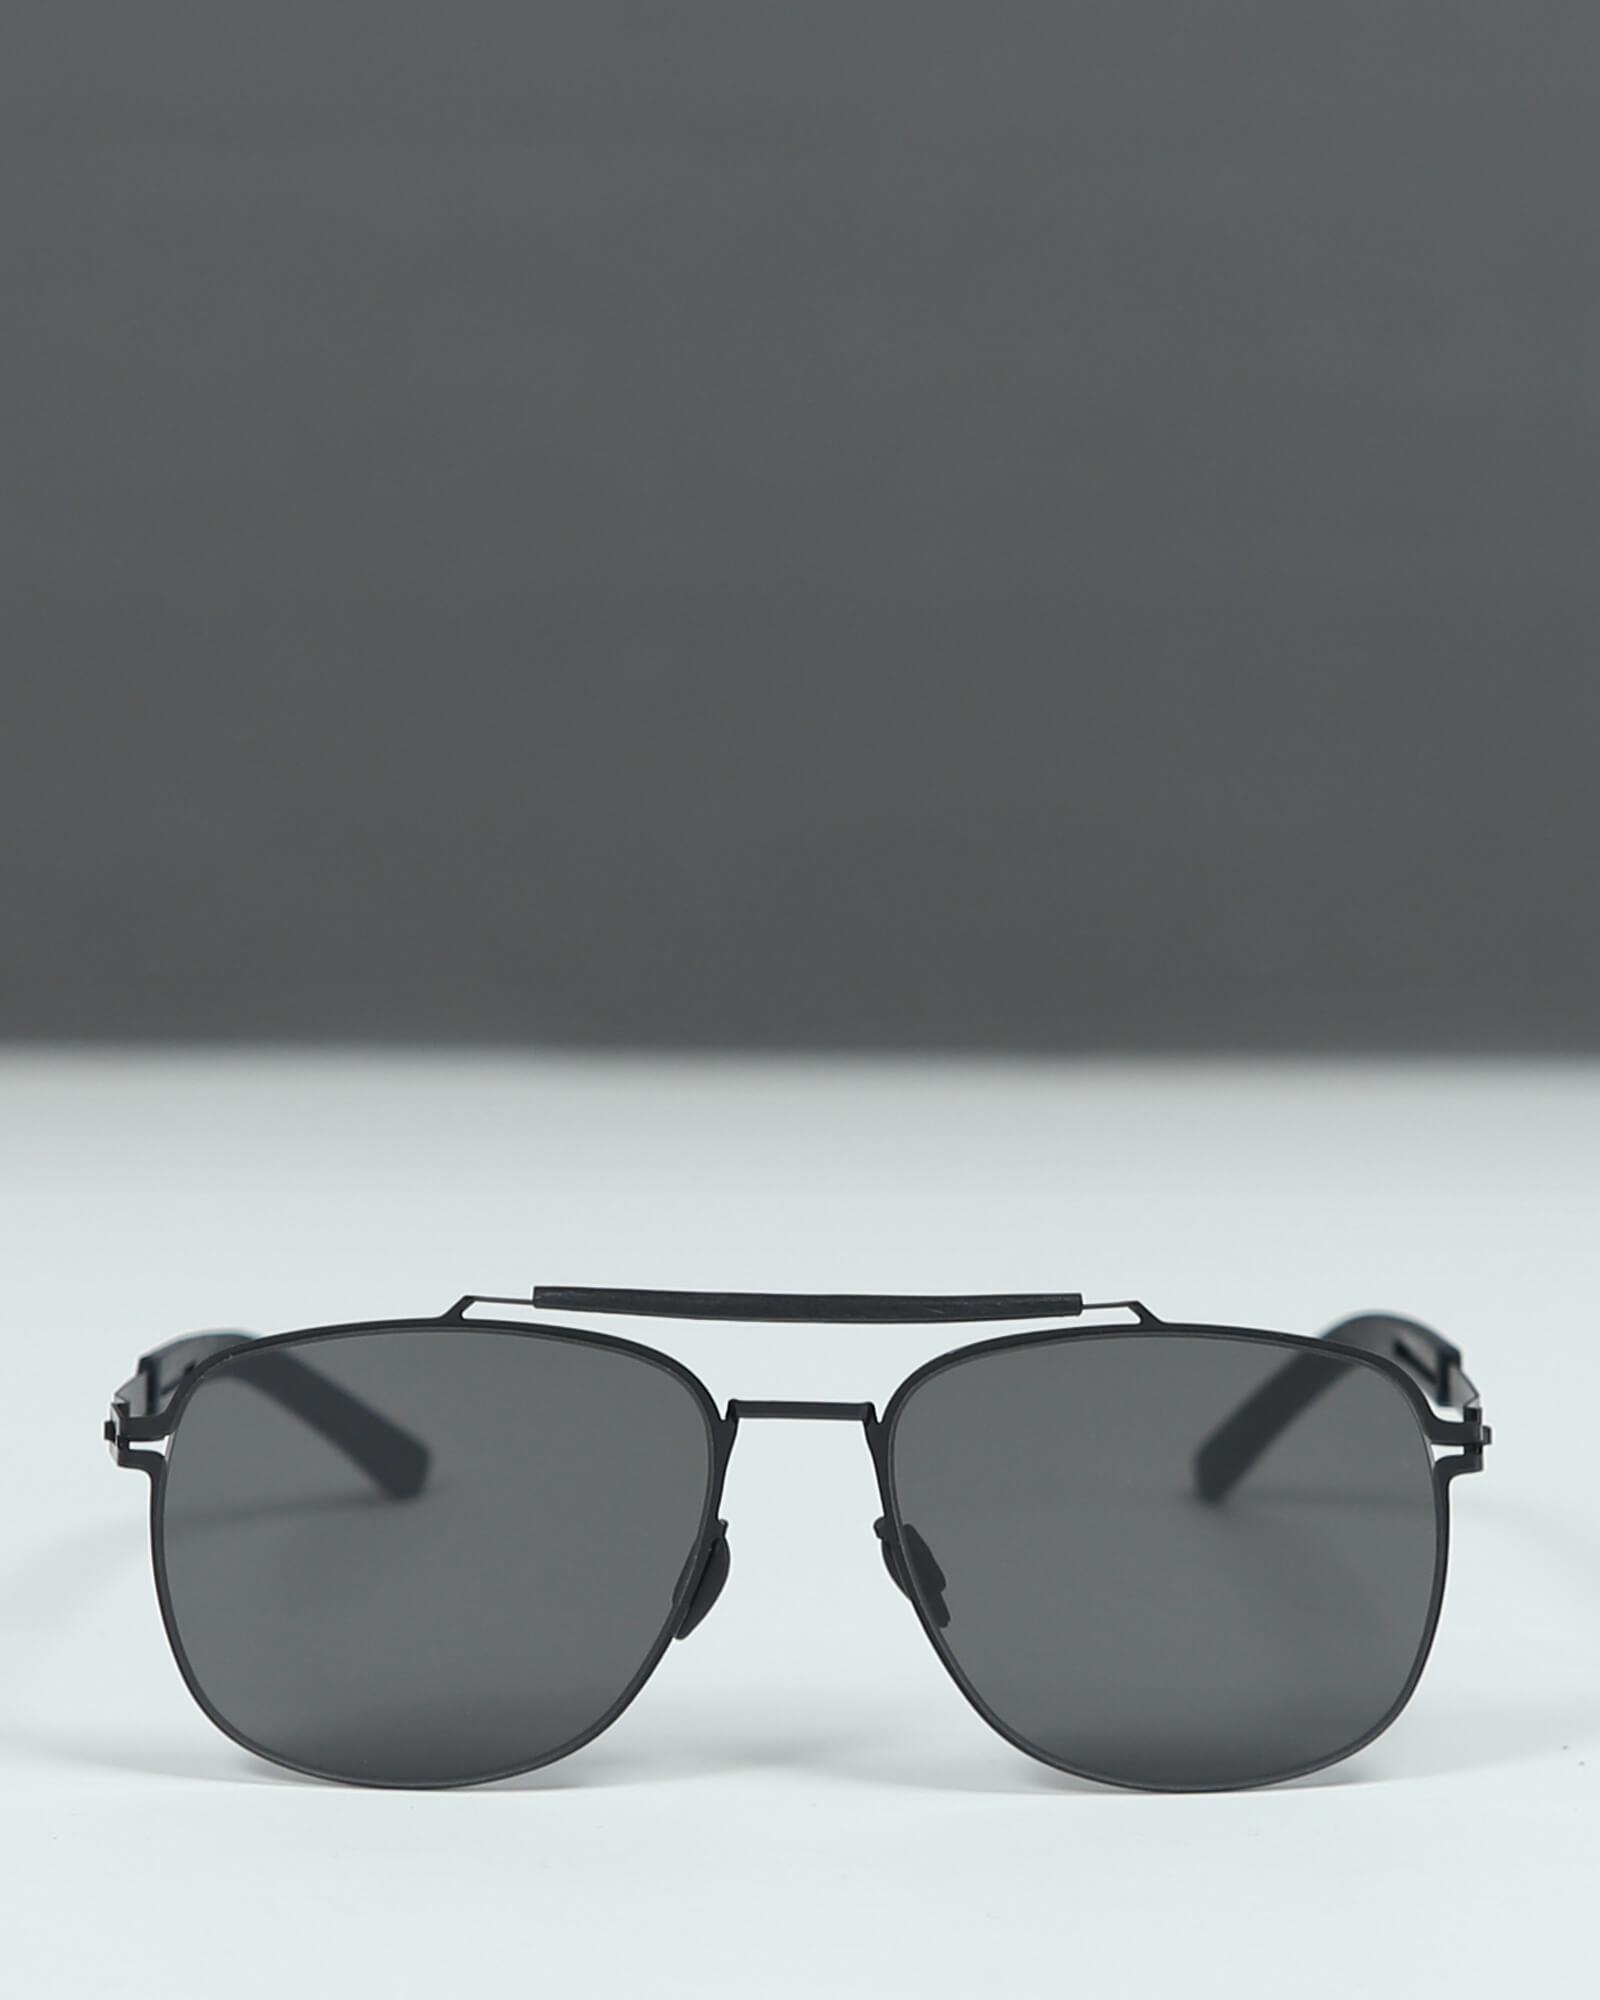 sunglass-1